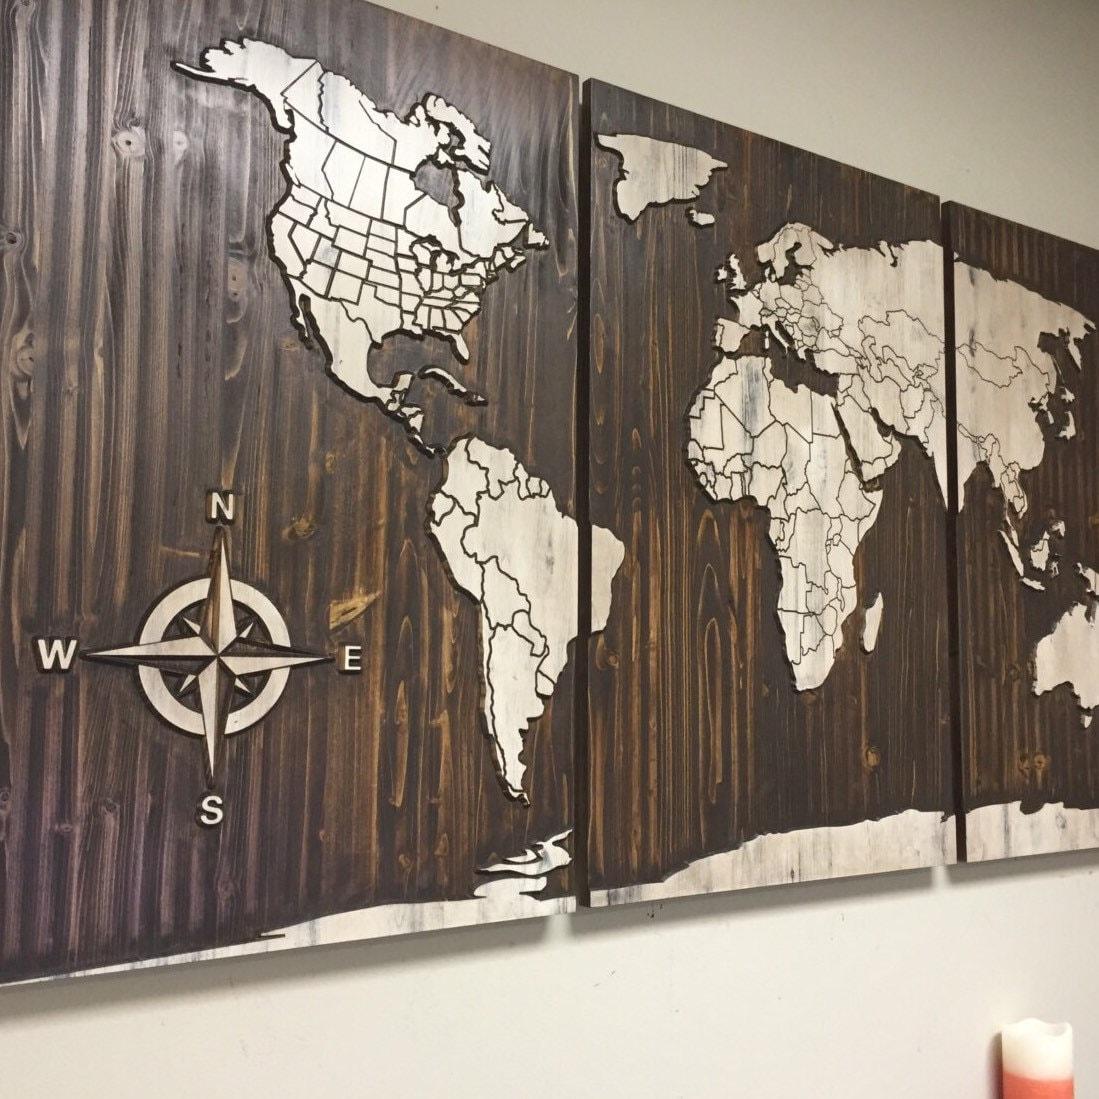 World Map Wall Decor Wood : World map wood wall art luxury home decor large wooden